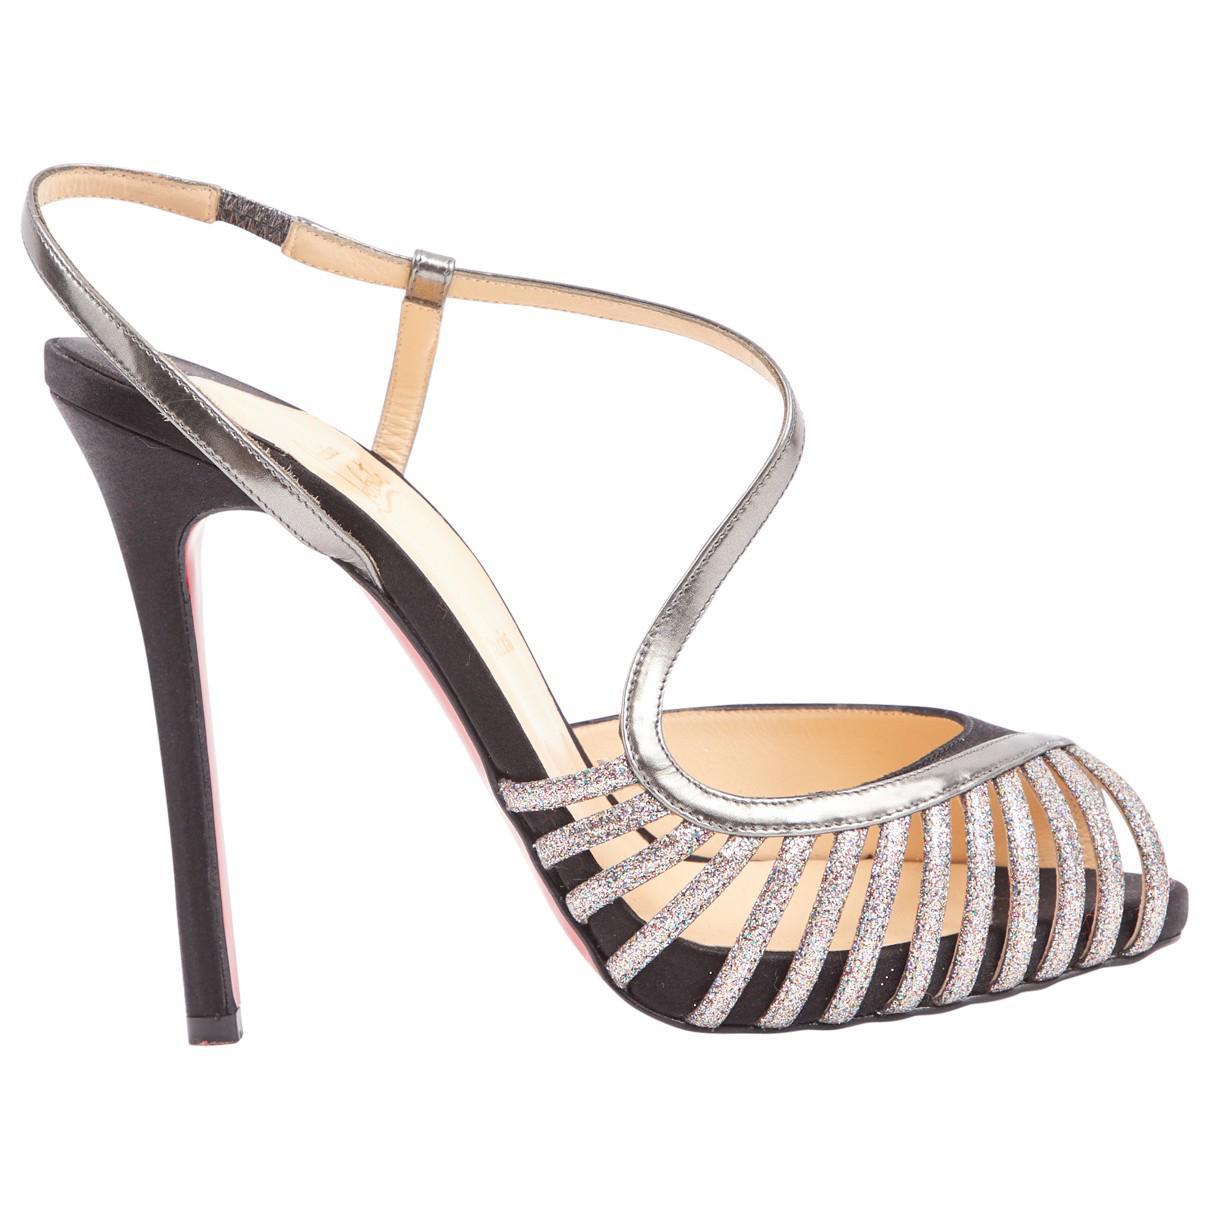 Pre-owned - Glitter sandals Christian Louboutin ewCsCpe28